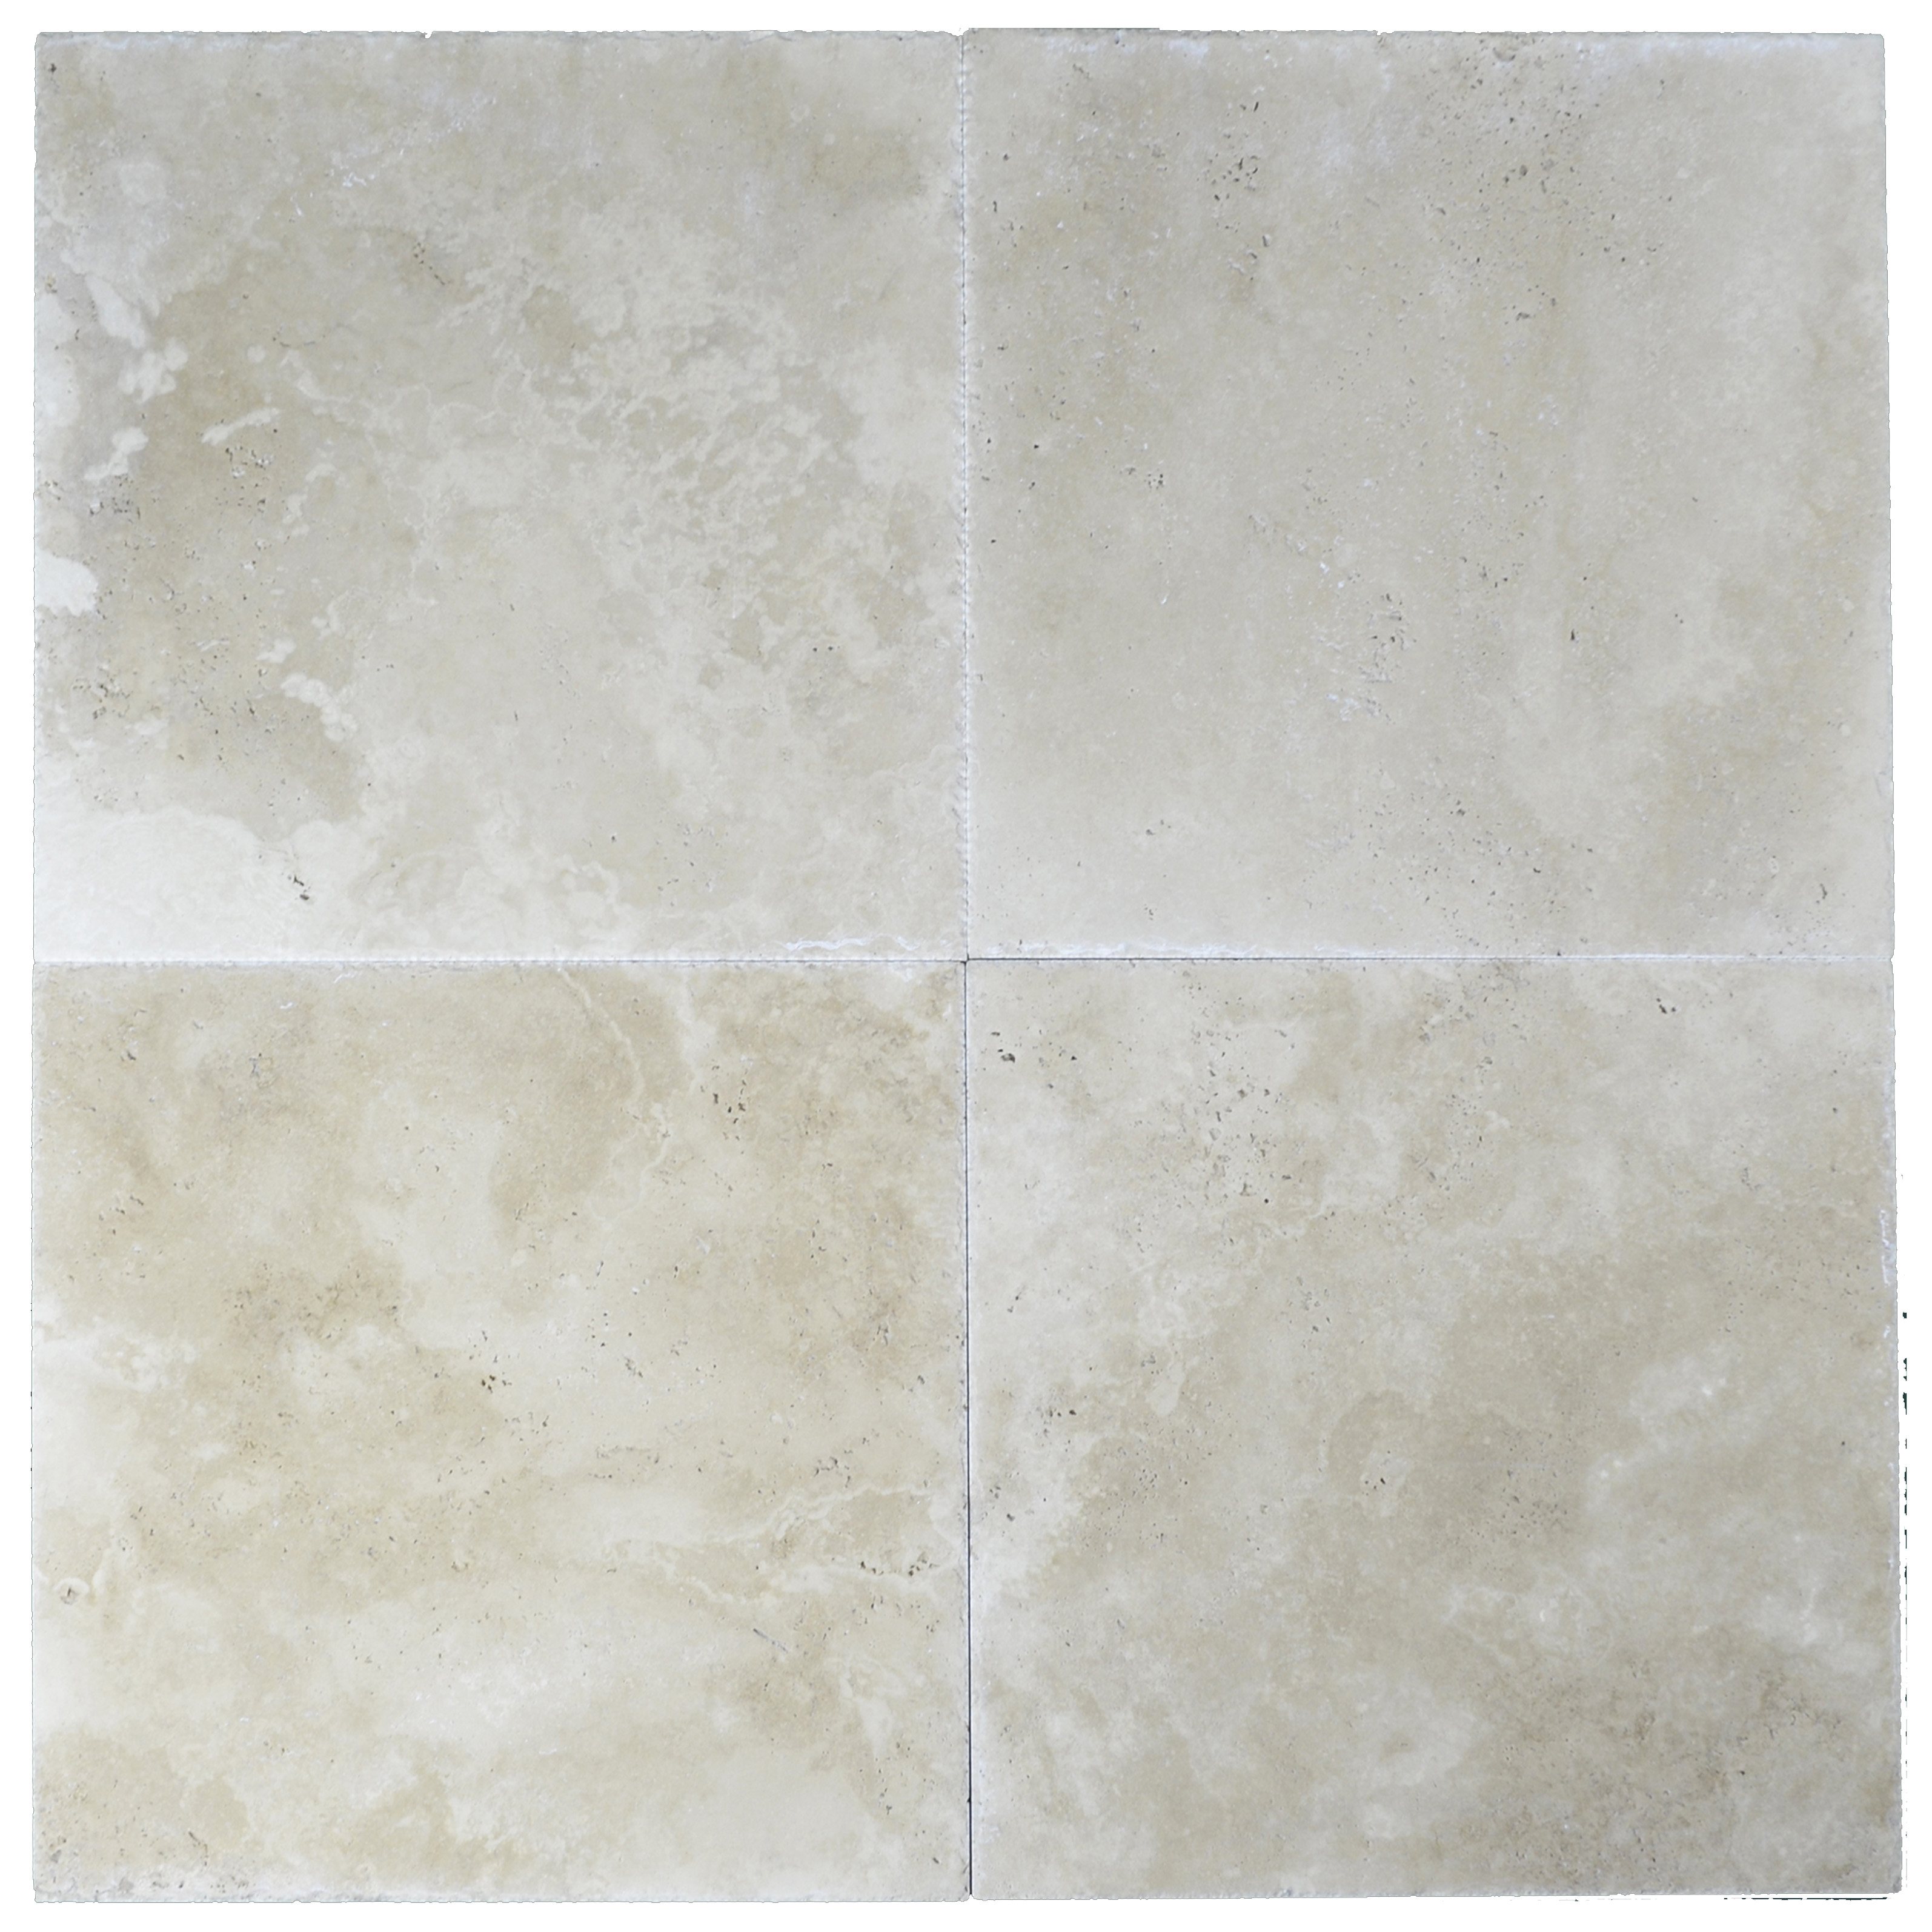 Super Light Brushed Chiseled Travertine Tiles 24x24 - Natural Stone ...